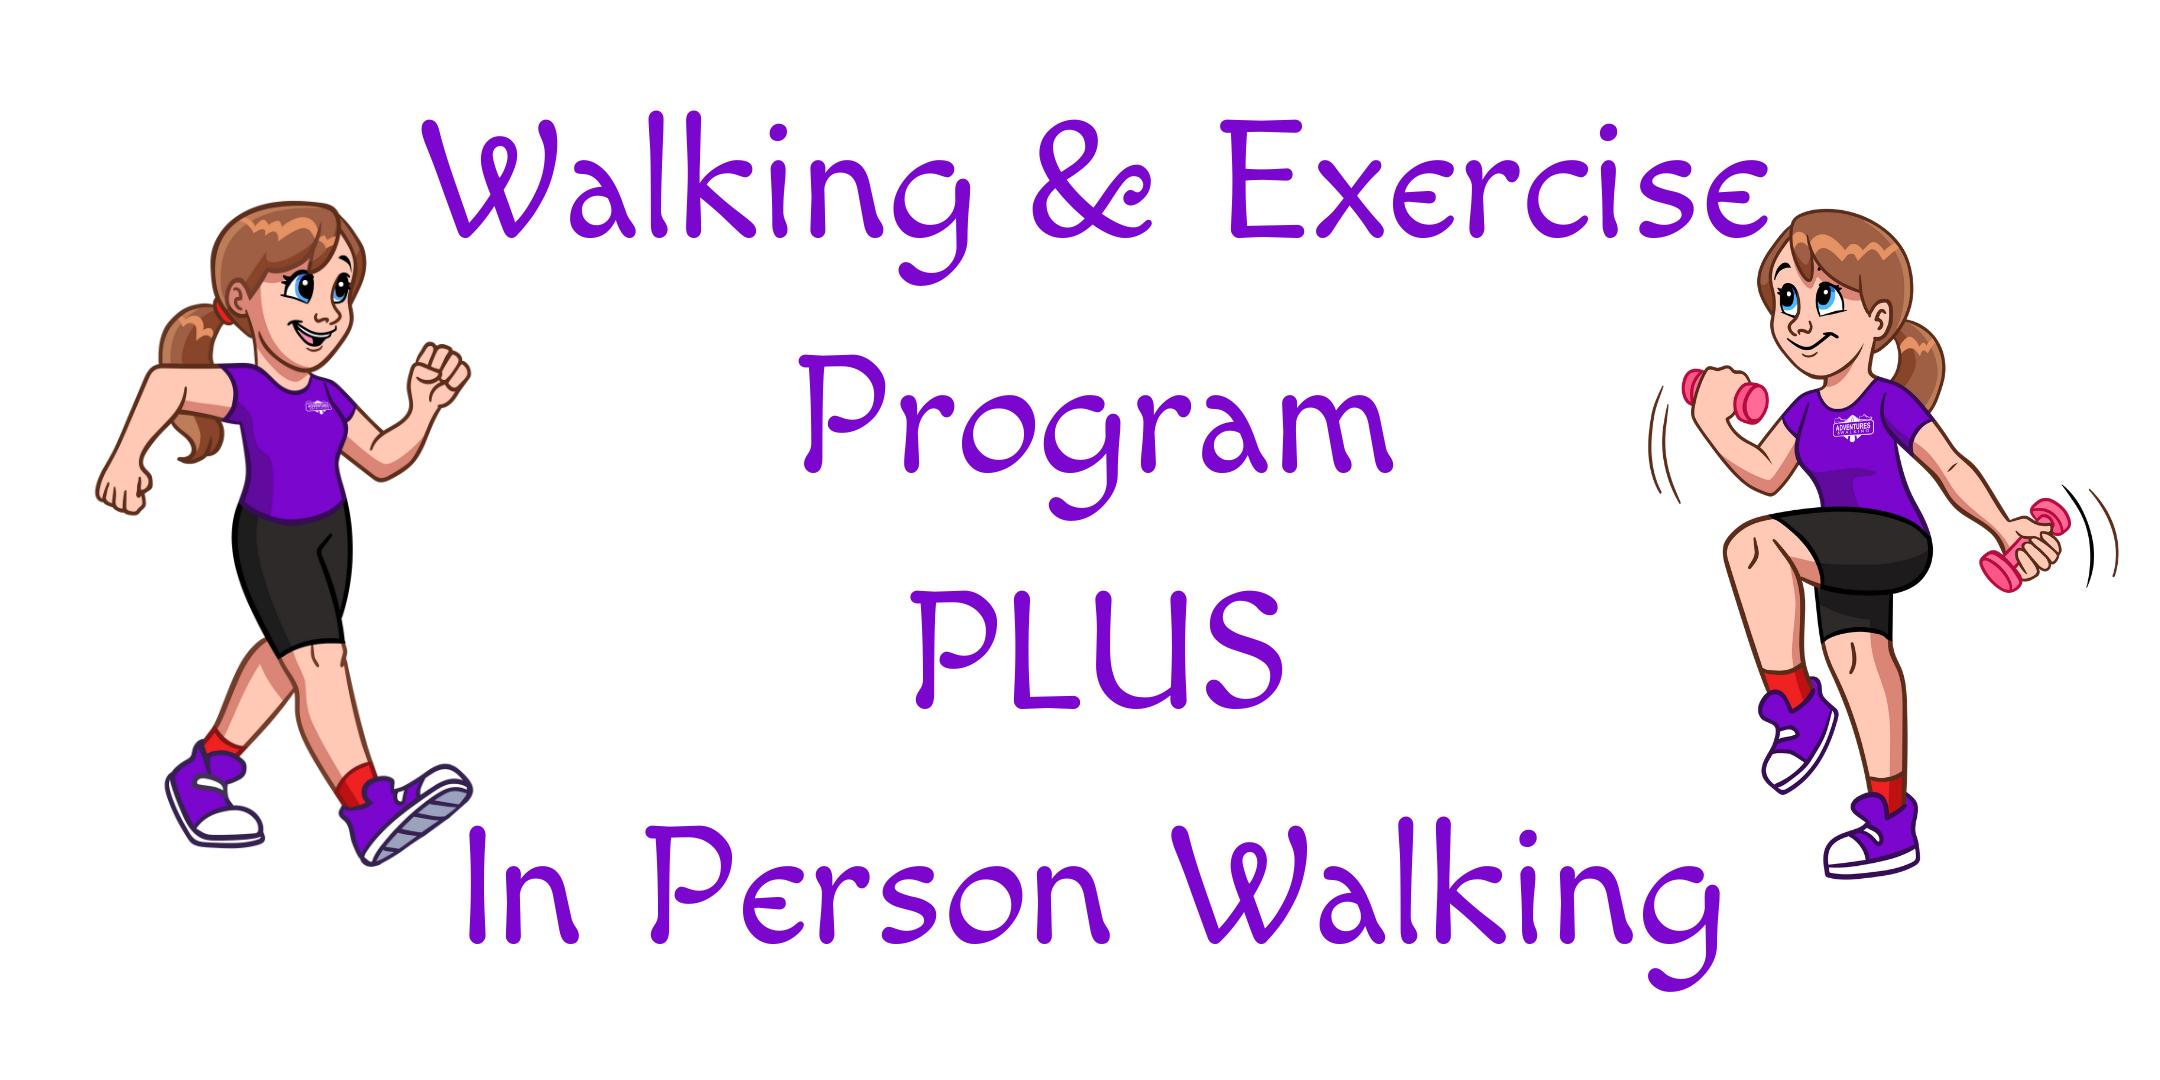 Walking & Exercise Program PLUS